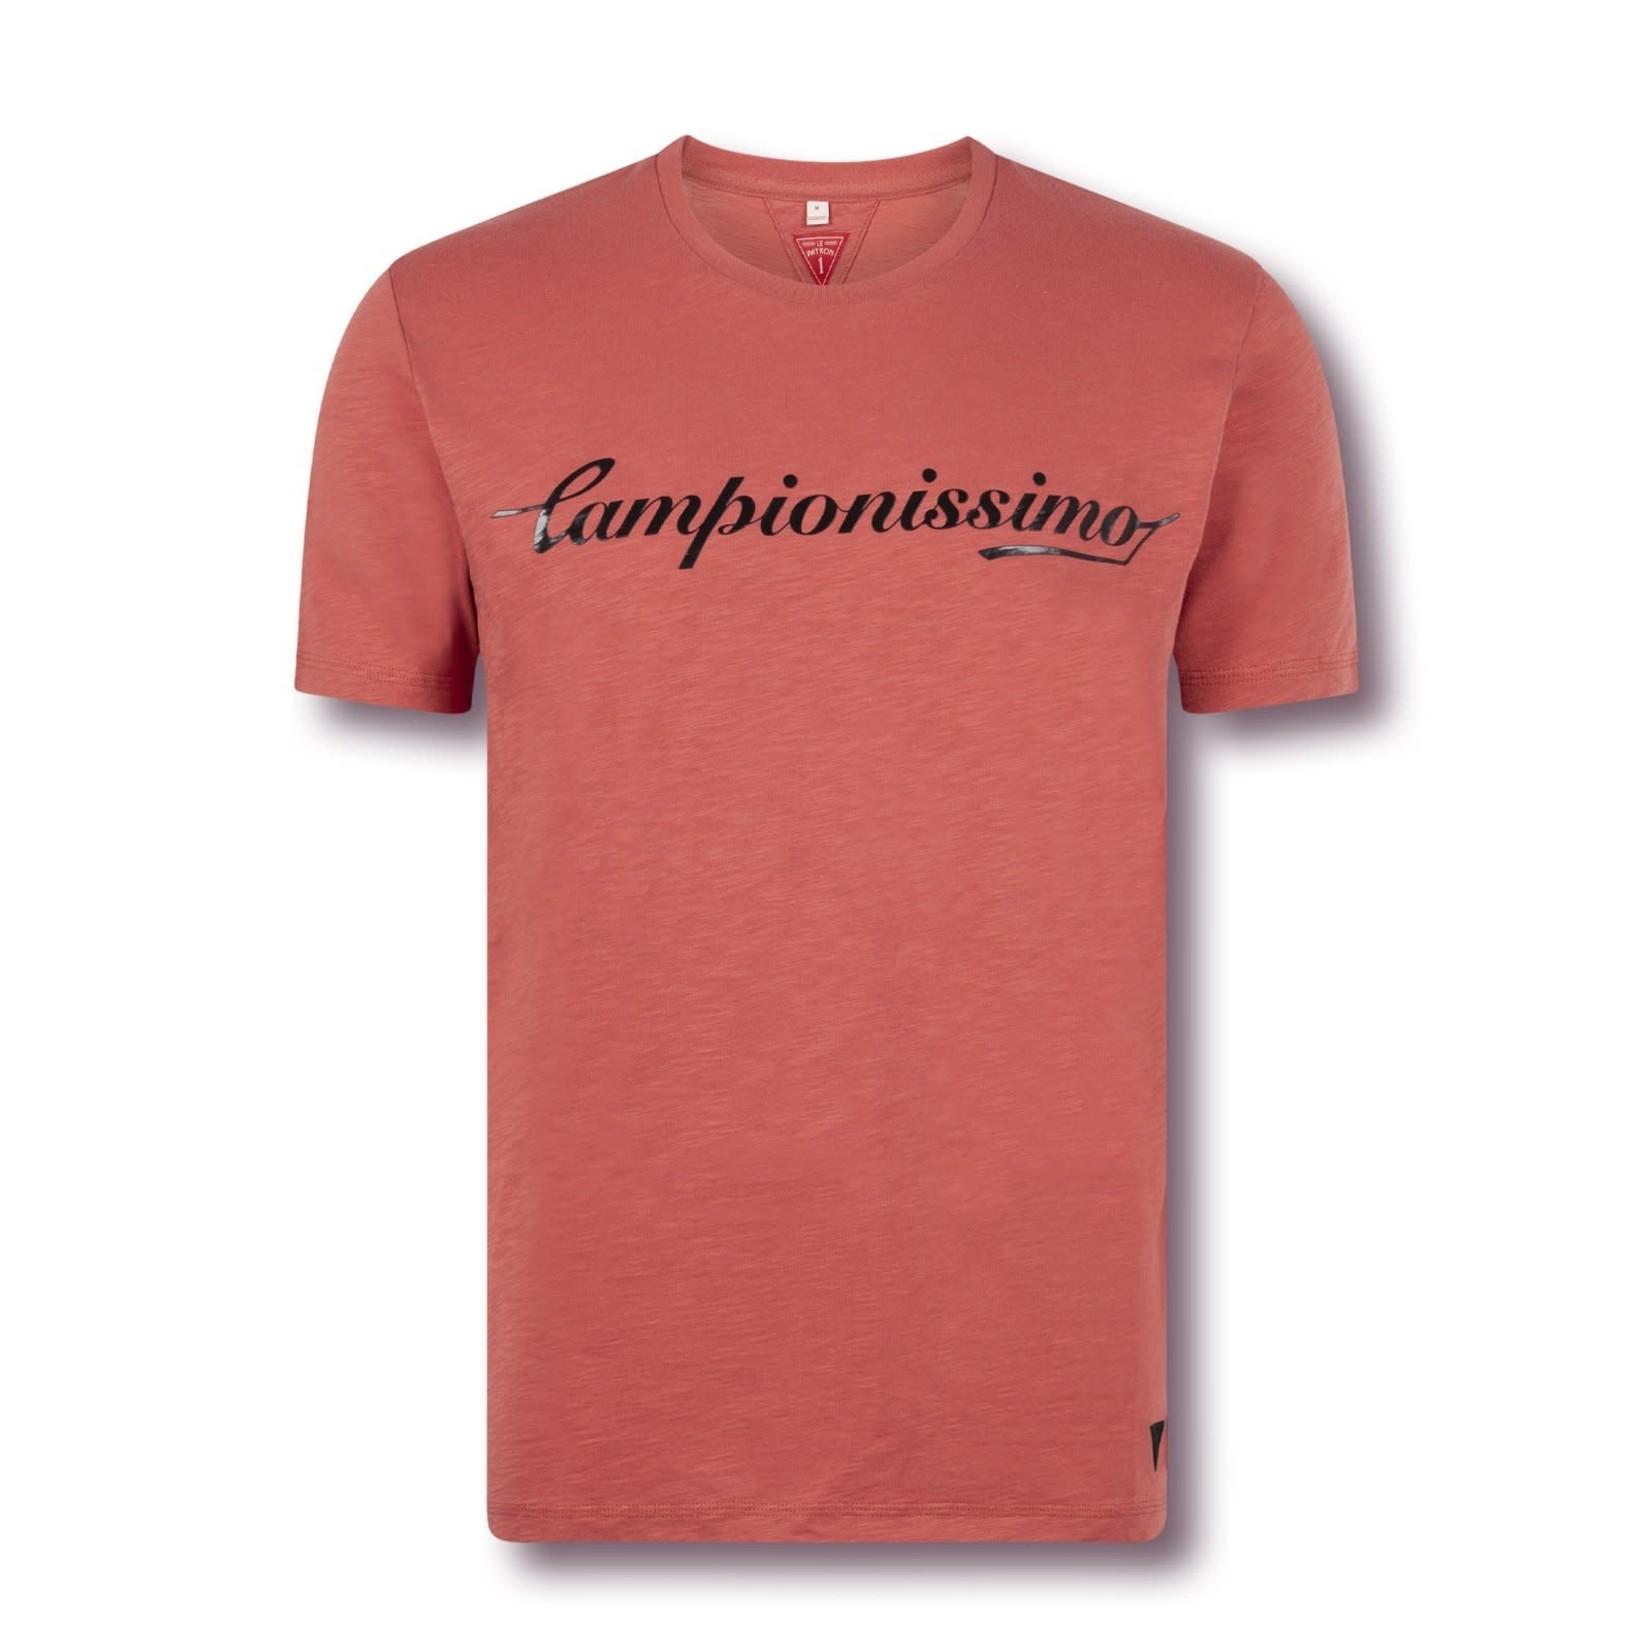 Le Patron T-shirt 'Il Campionissimo'